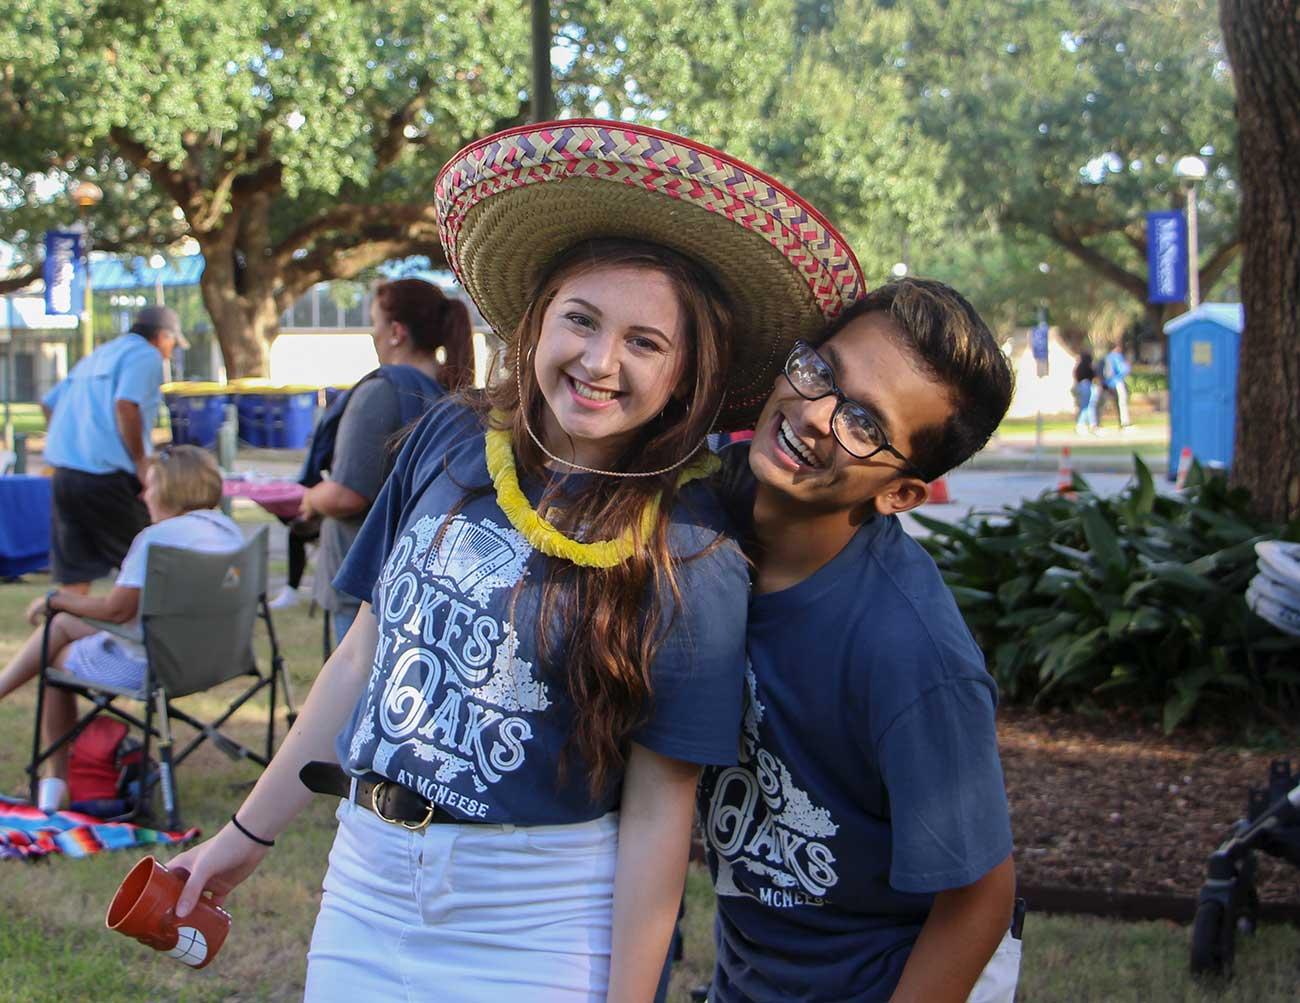 McNeese Student celebrate Pokes in the Oaks